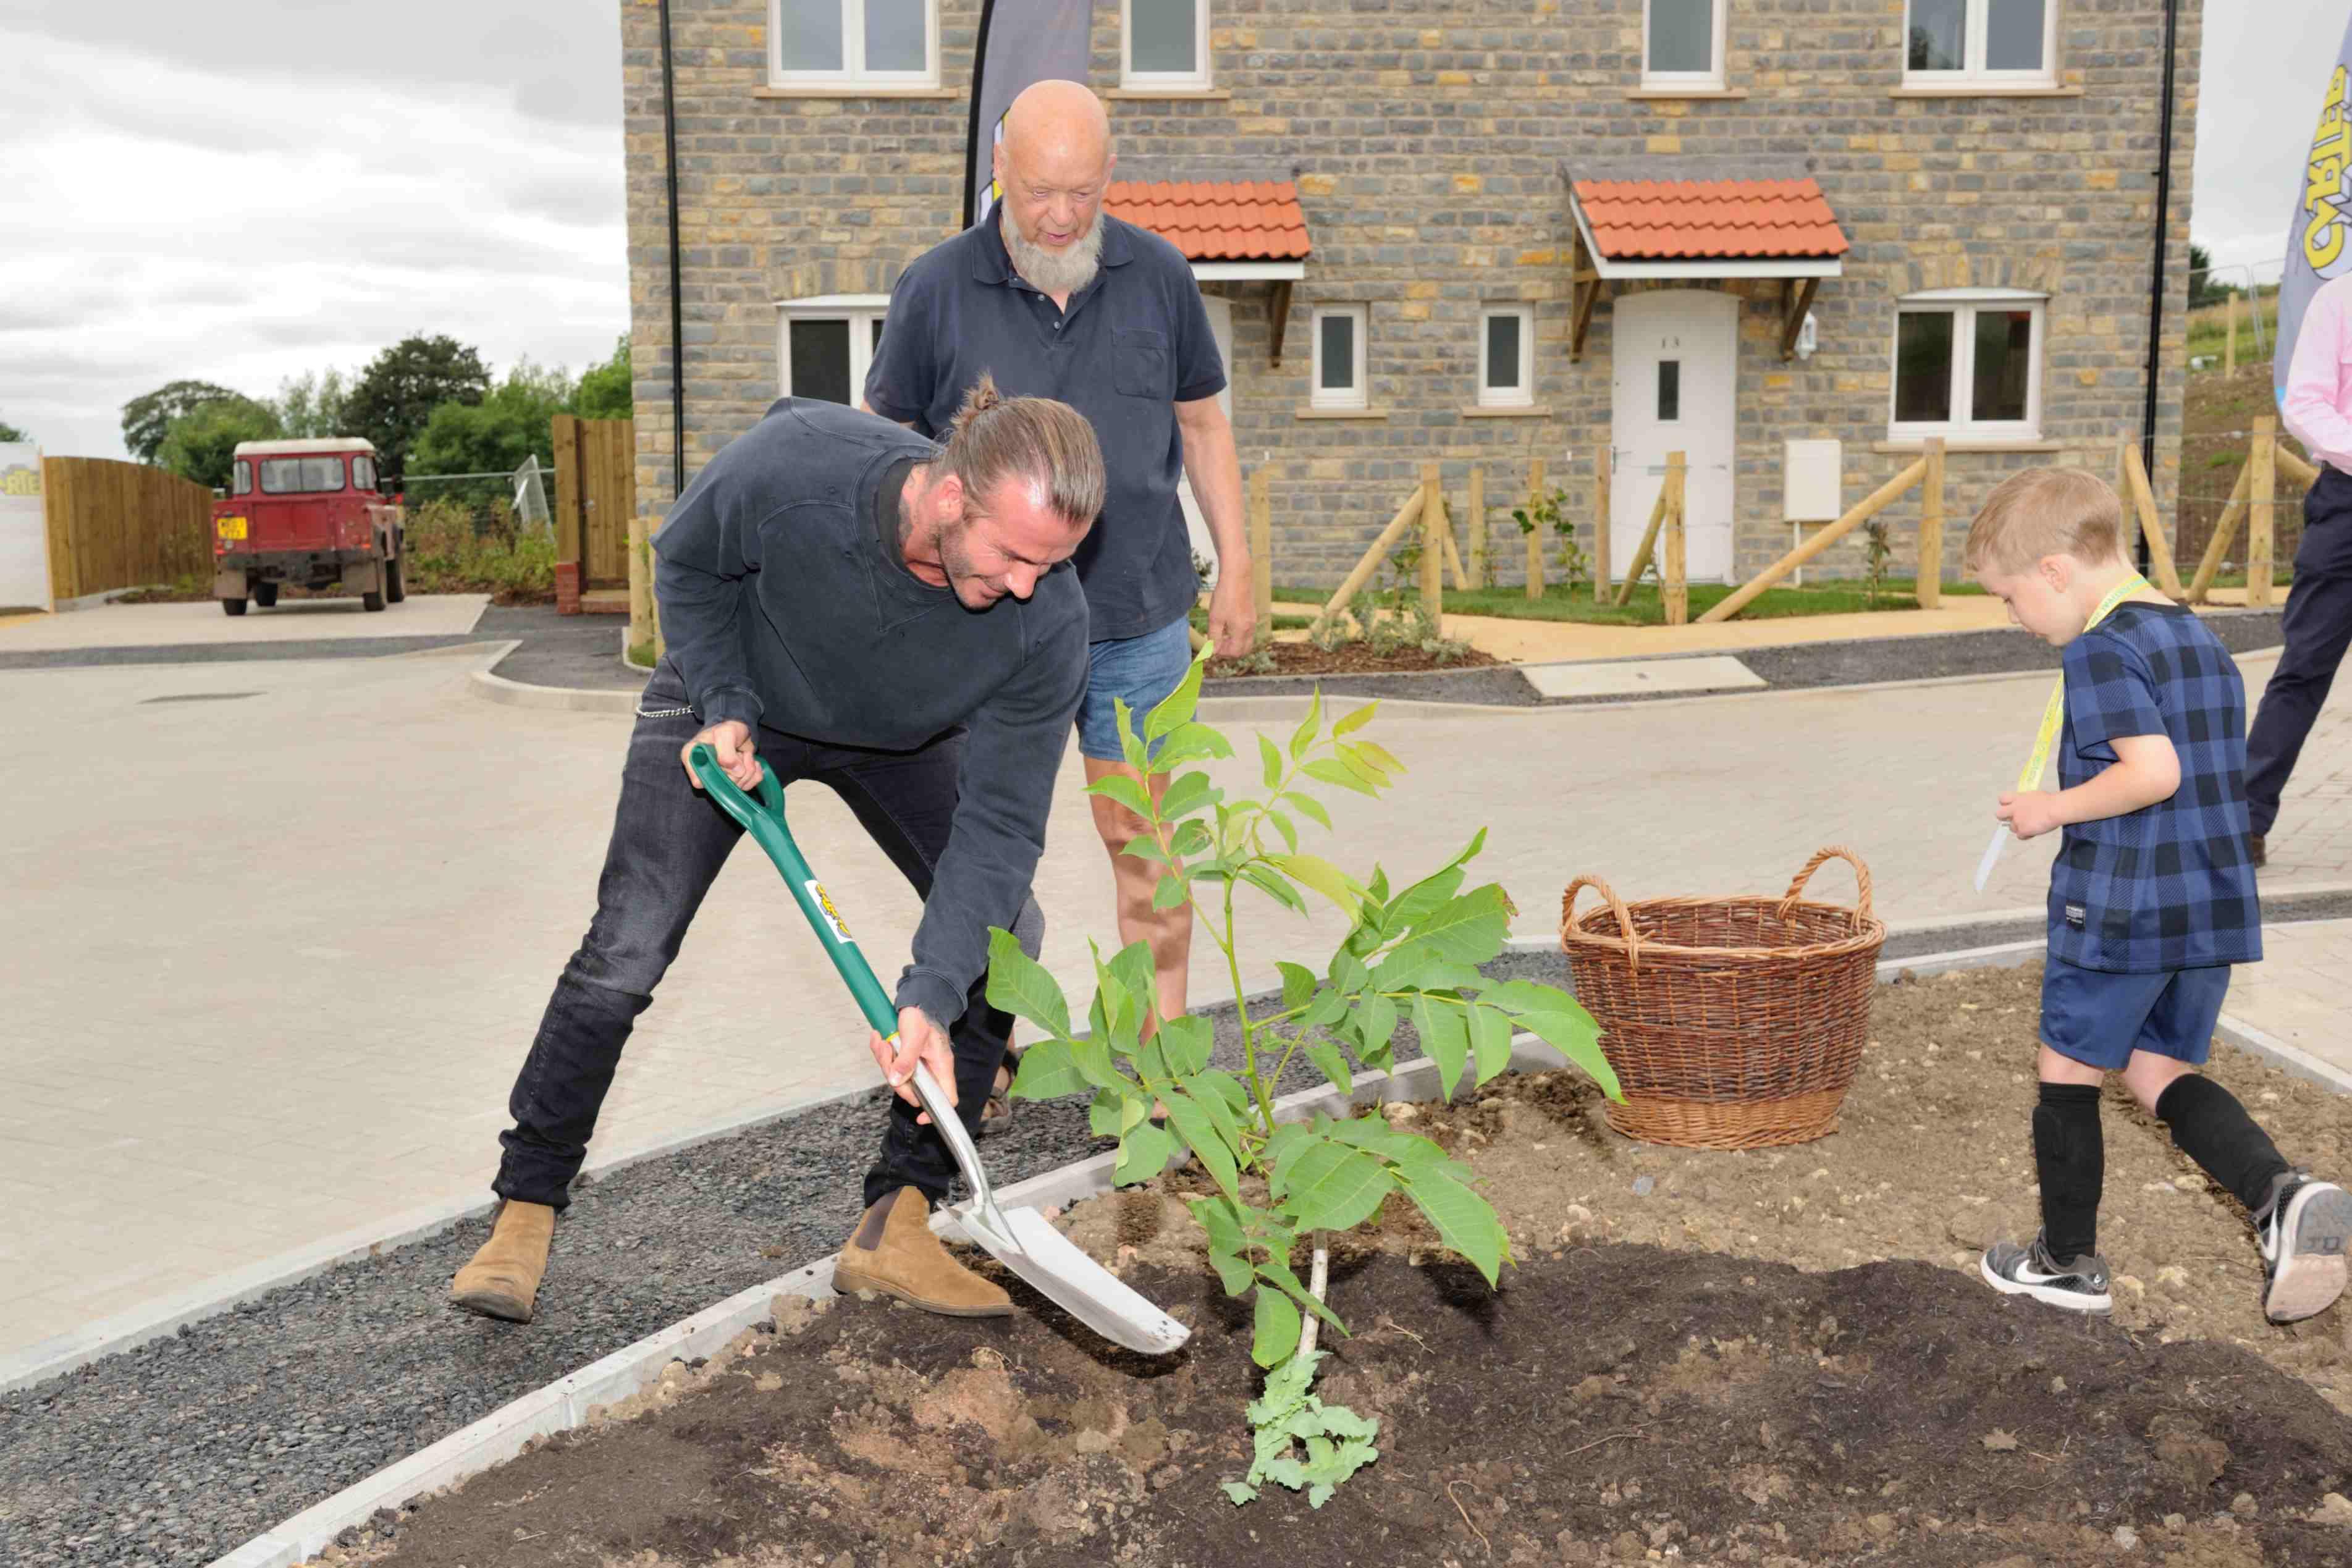 David Beckham planting a tree at Pilton, Somerset